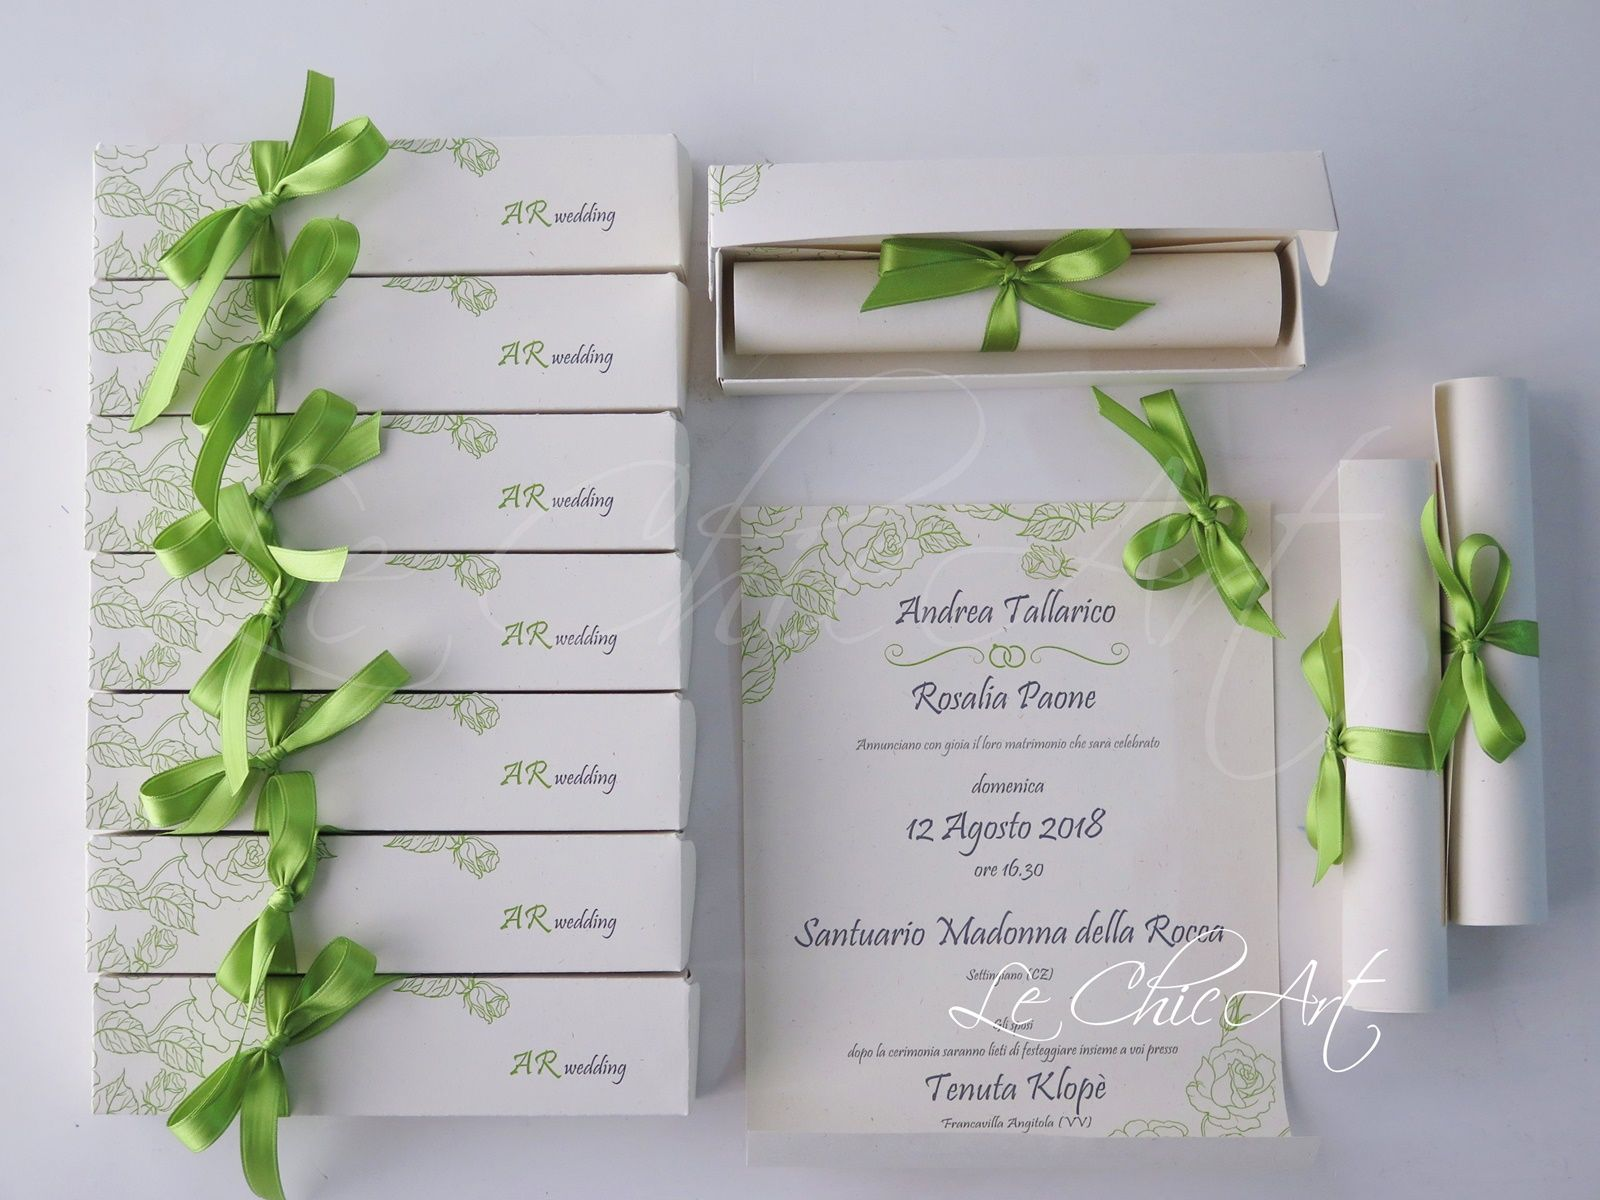 Partecipazione Matrimonio Tema Rose Colore Verde Pistacchio Matrimonio Matrimonio Personalizzato Matrimonio Minimalista